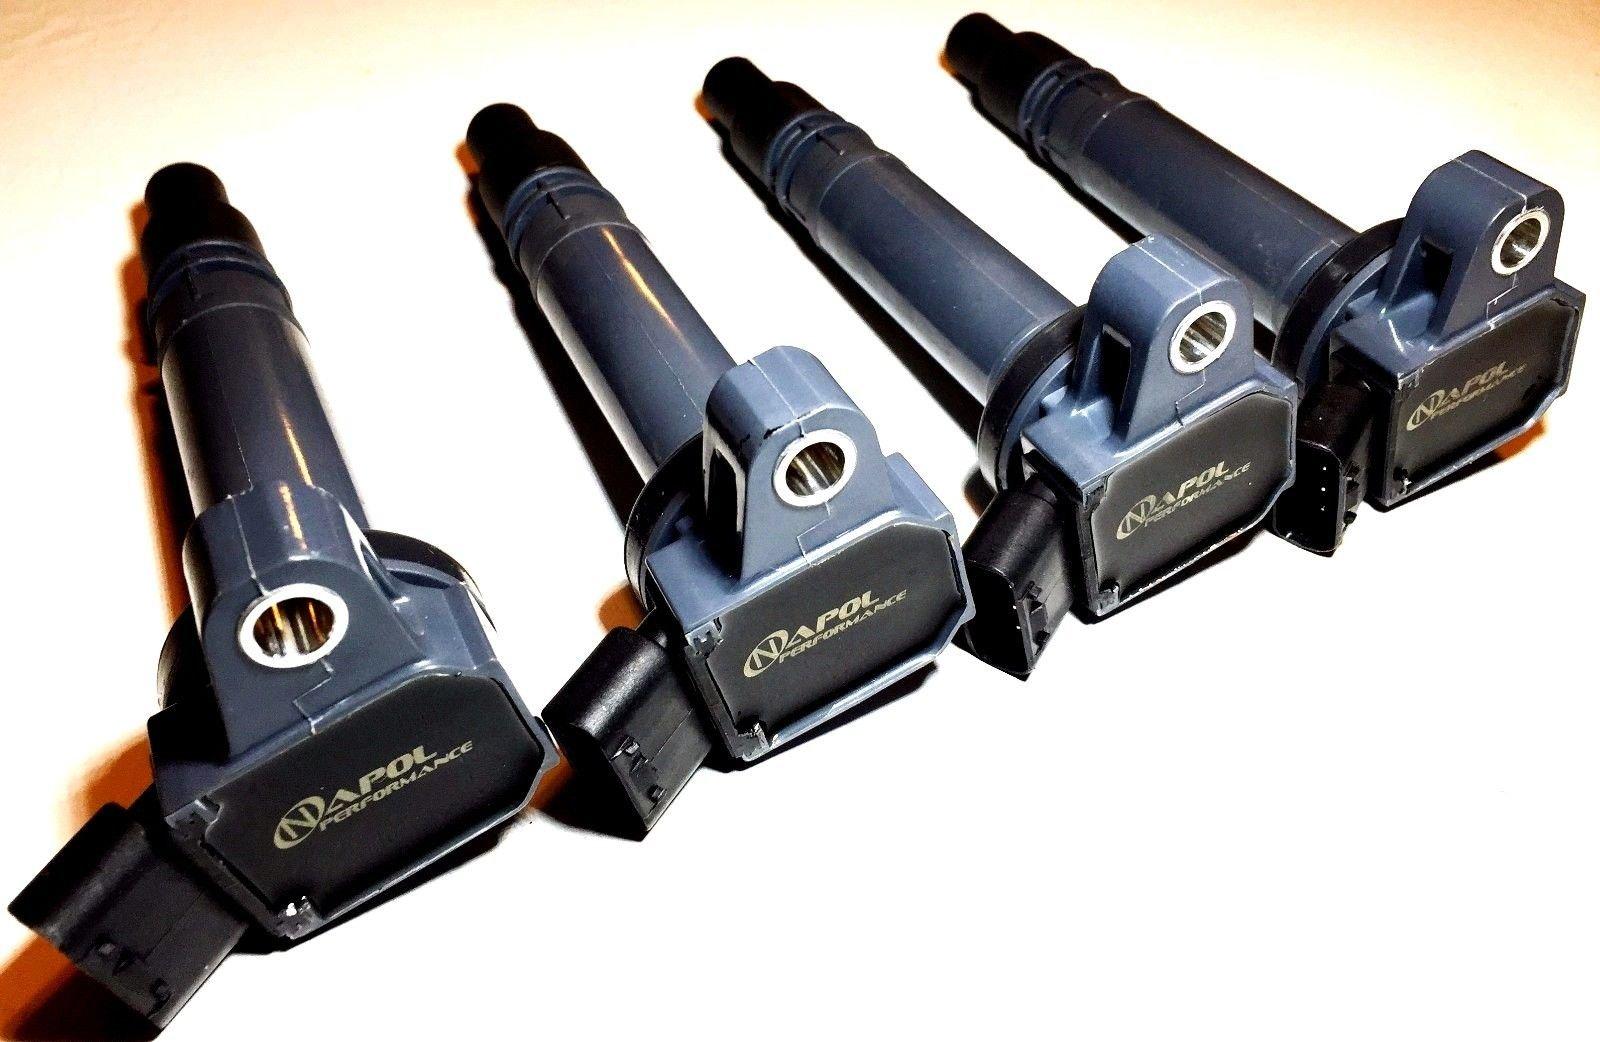 Napol Performance Parts 00-06 IGNITION COIL PACKS TOYOTA PONTIAC 1.8L COROLLA CELICA MATRIX VIBE UF-314